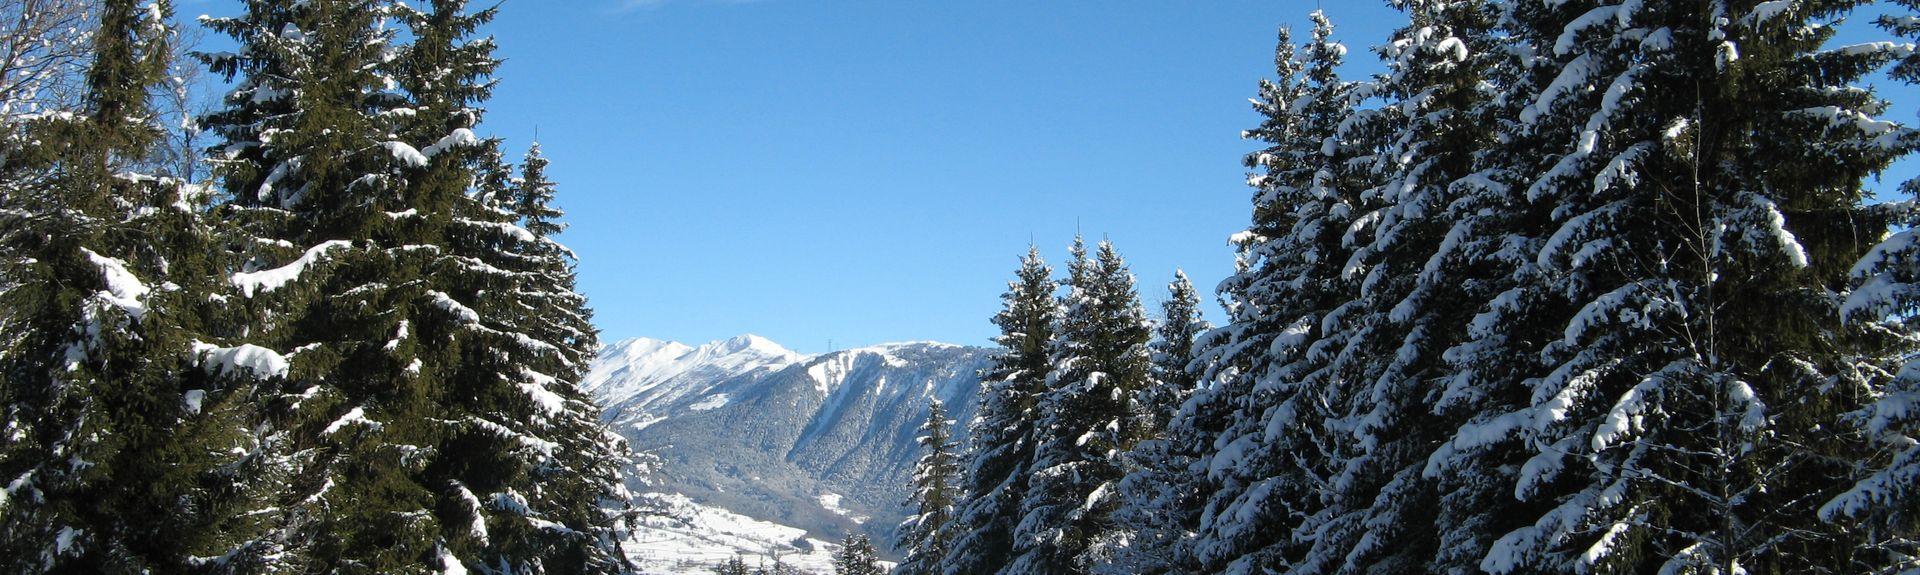 Montagny, Savojen, Auvergne - Rhône - Alpes, Frankrike